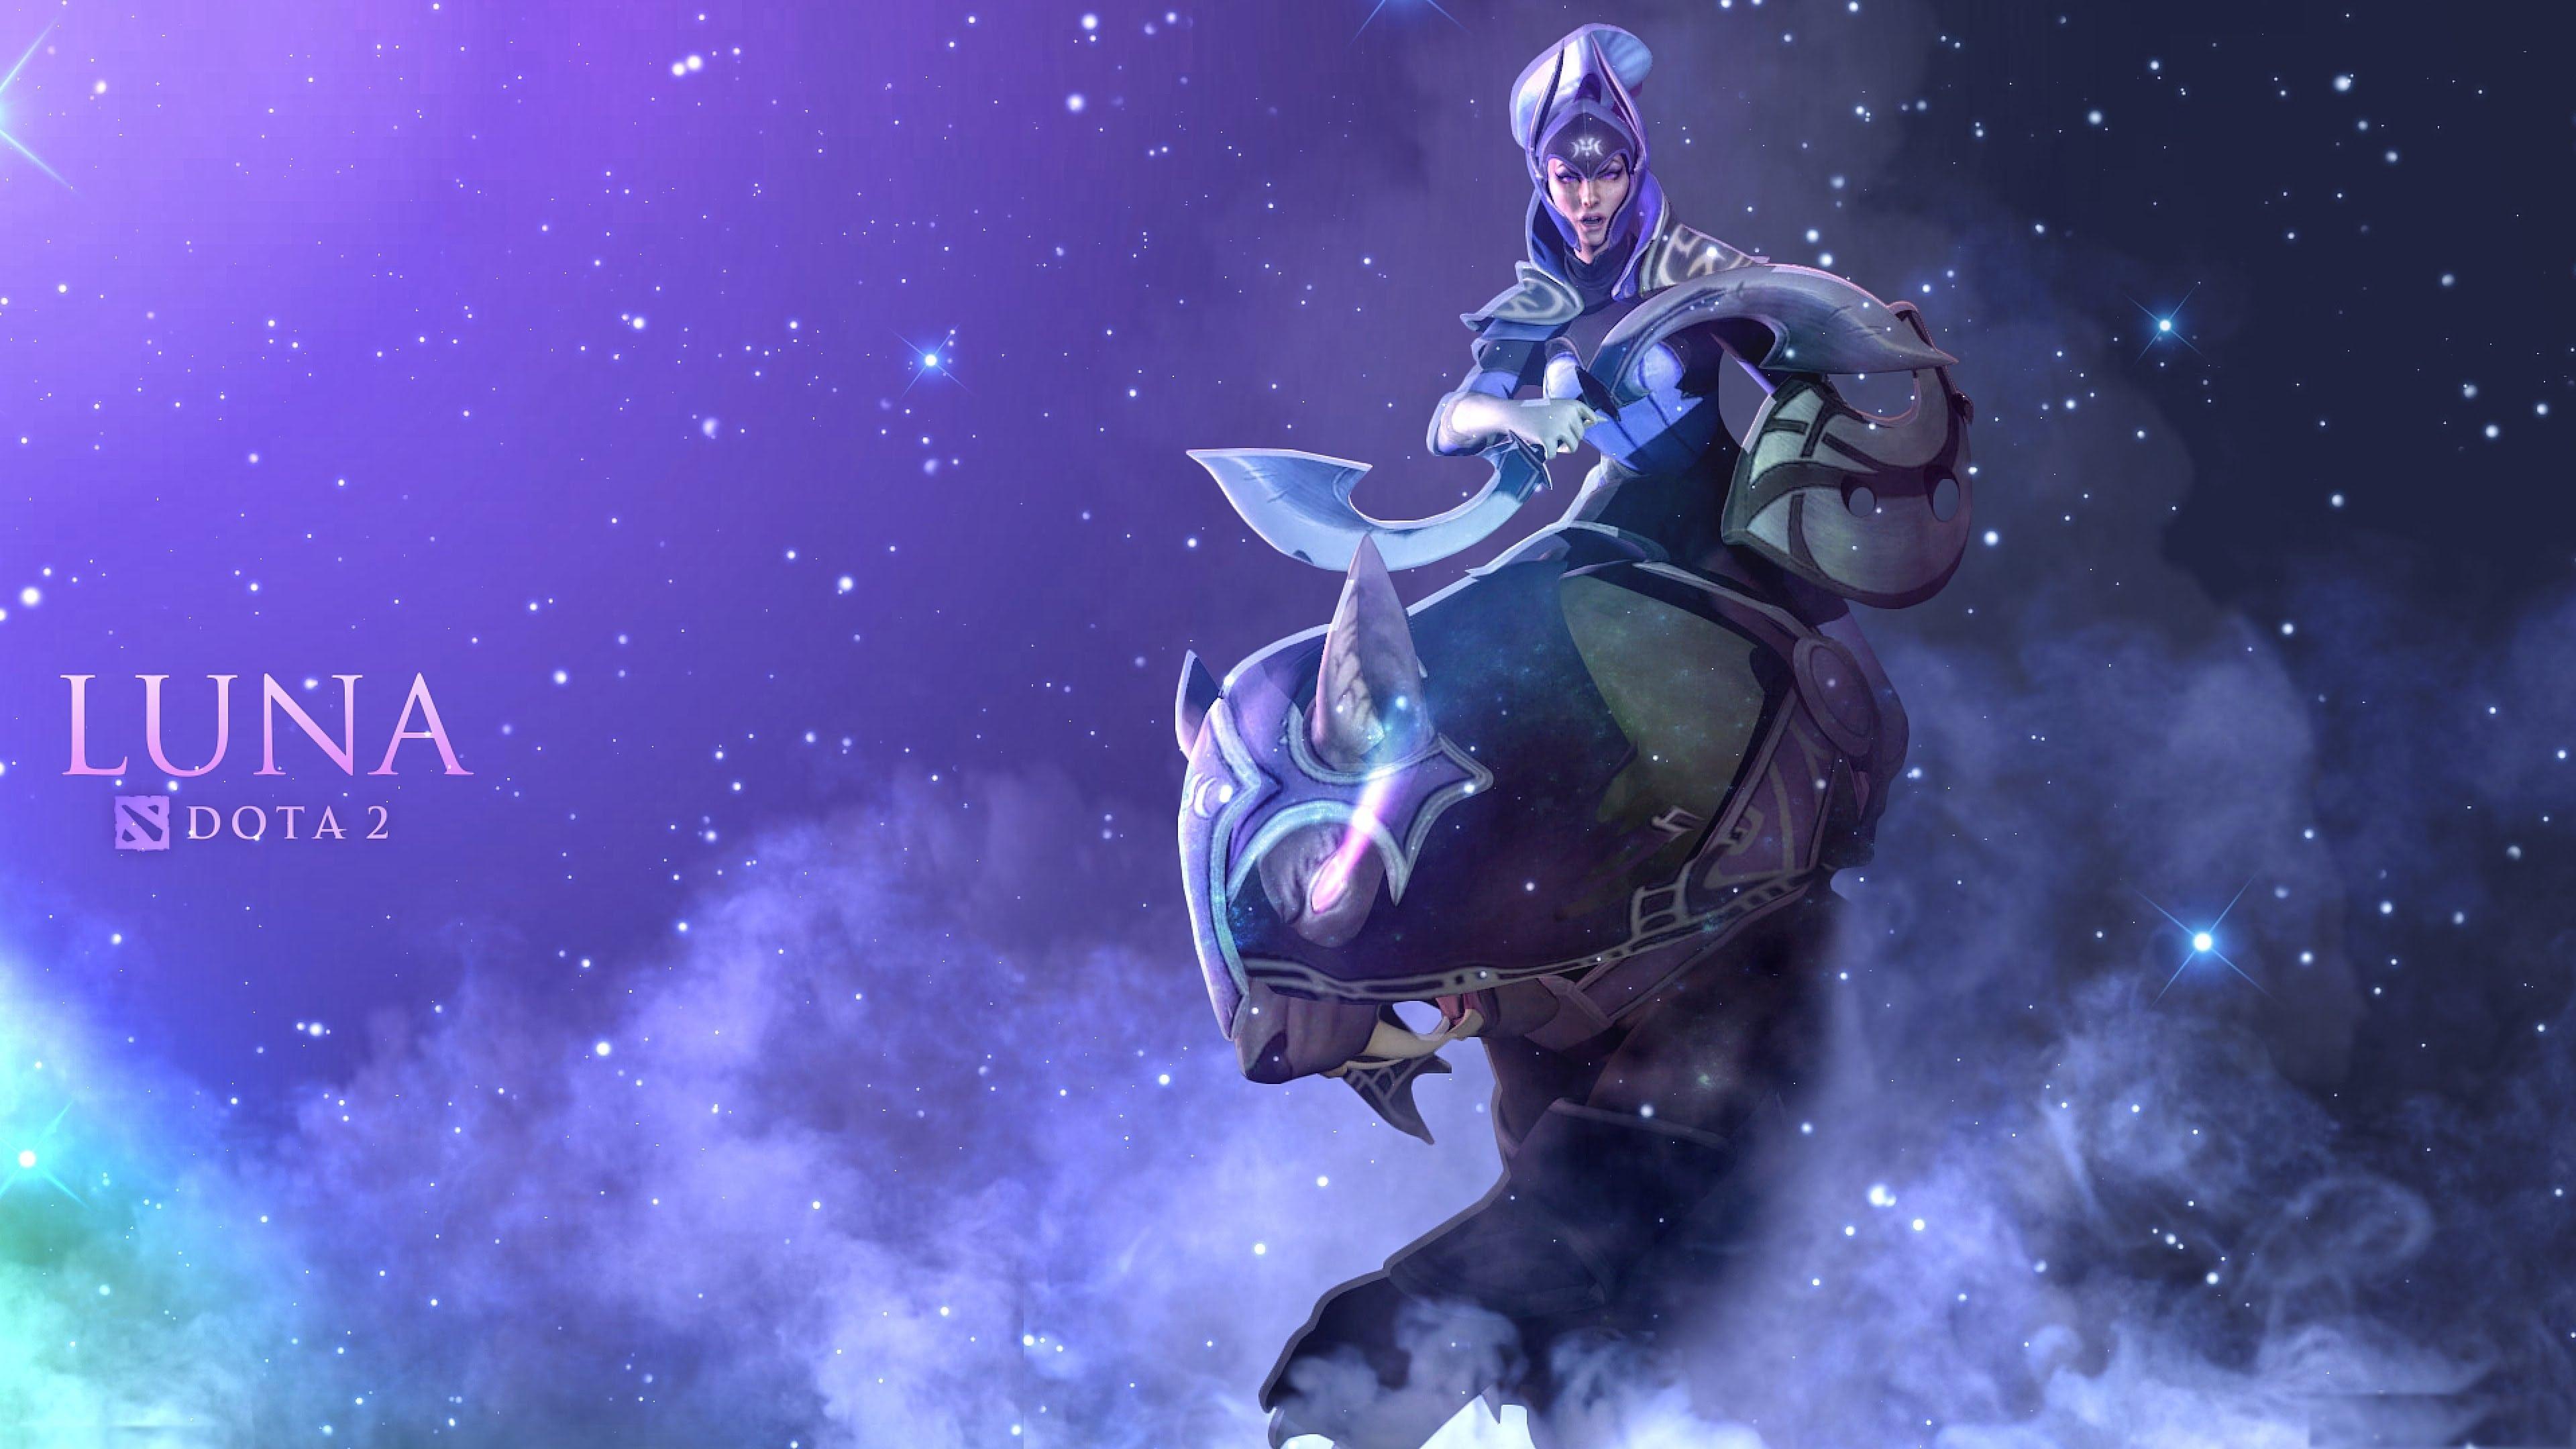 Dota2 : Luna HQ wallpapers